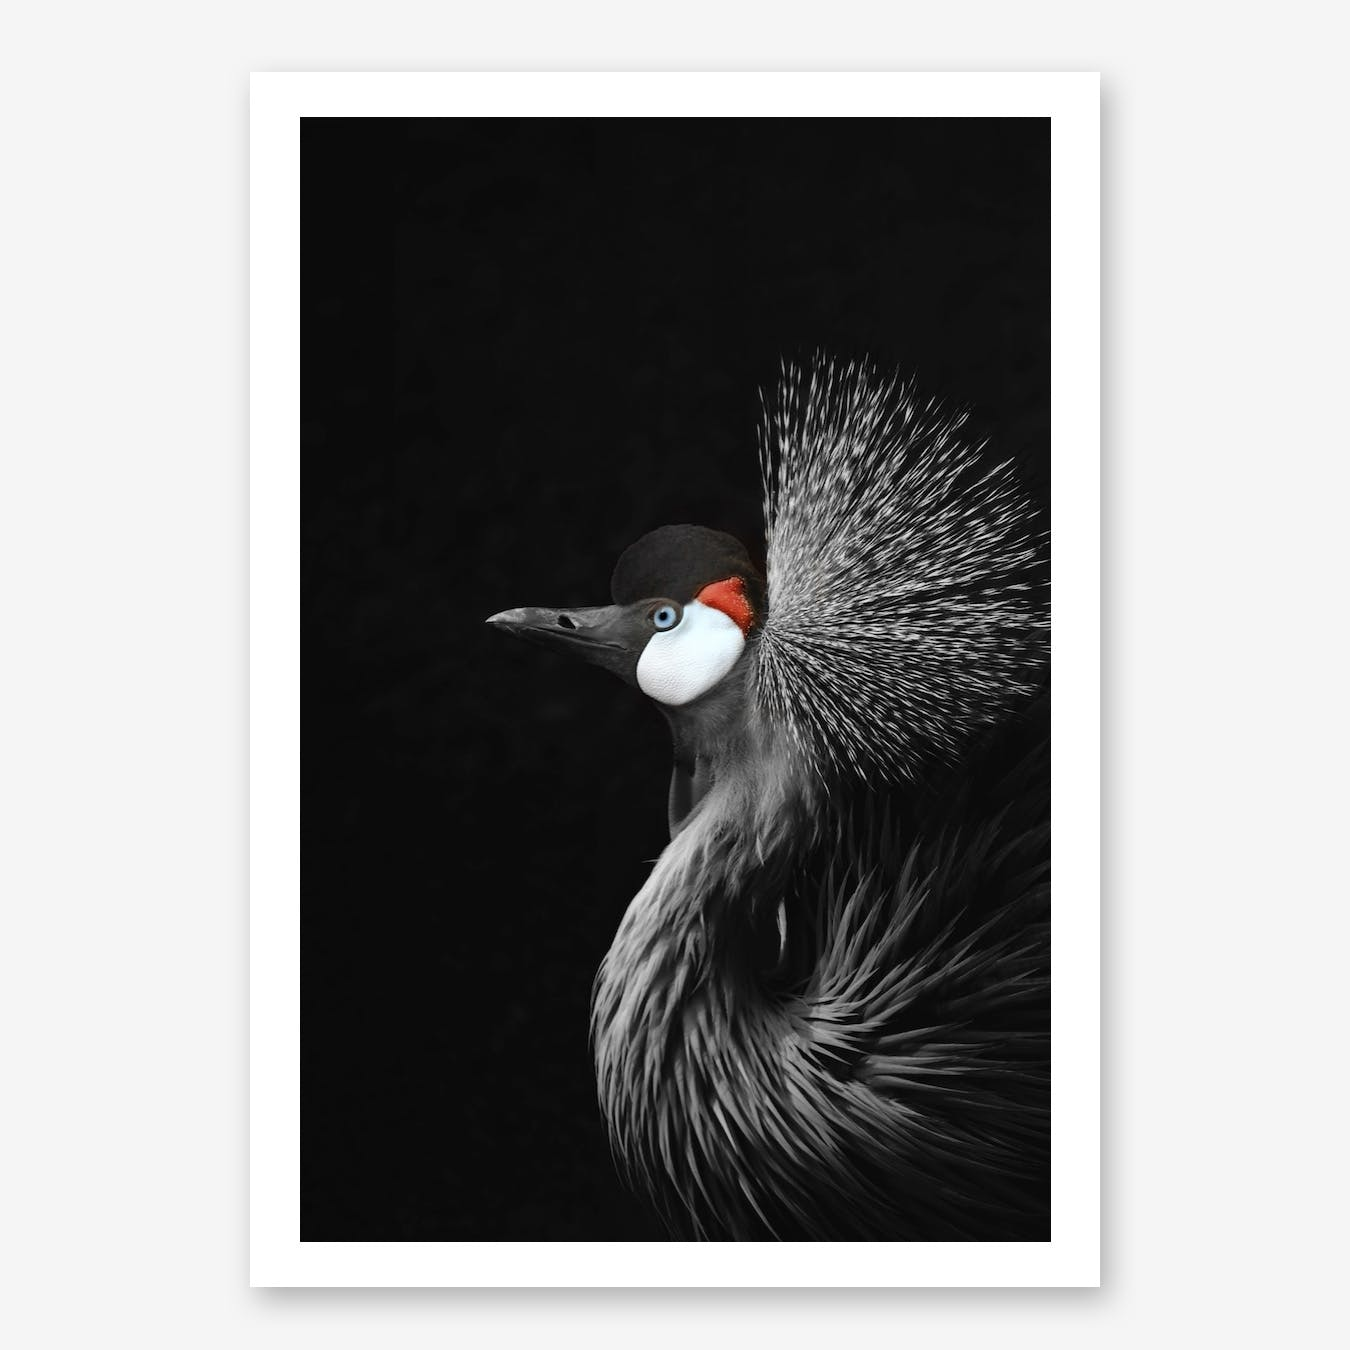 Crowned Crane in Print